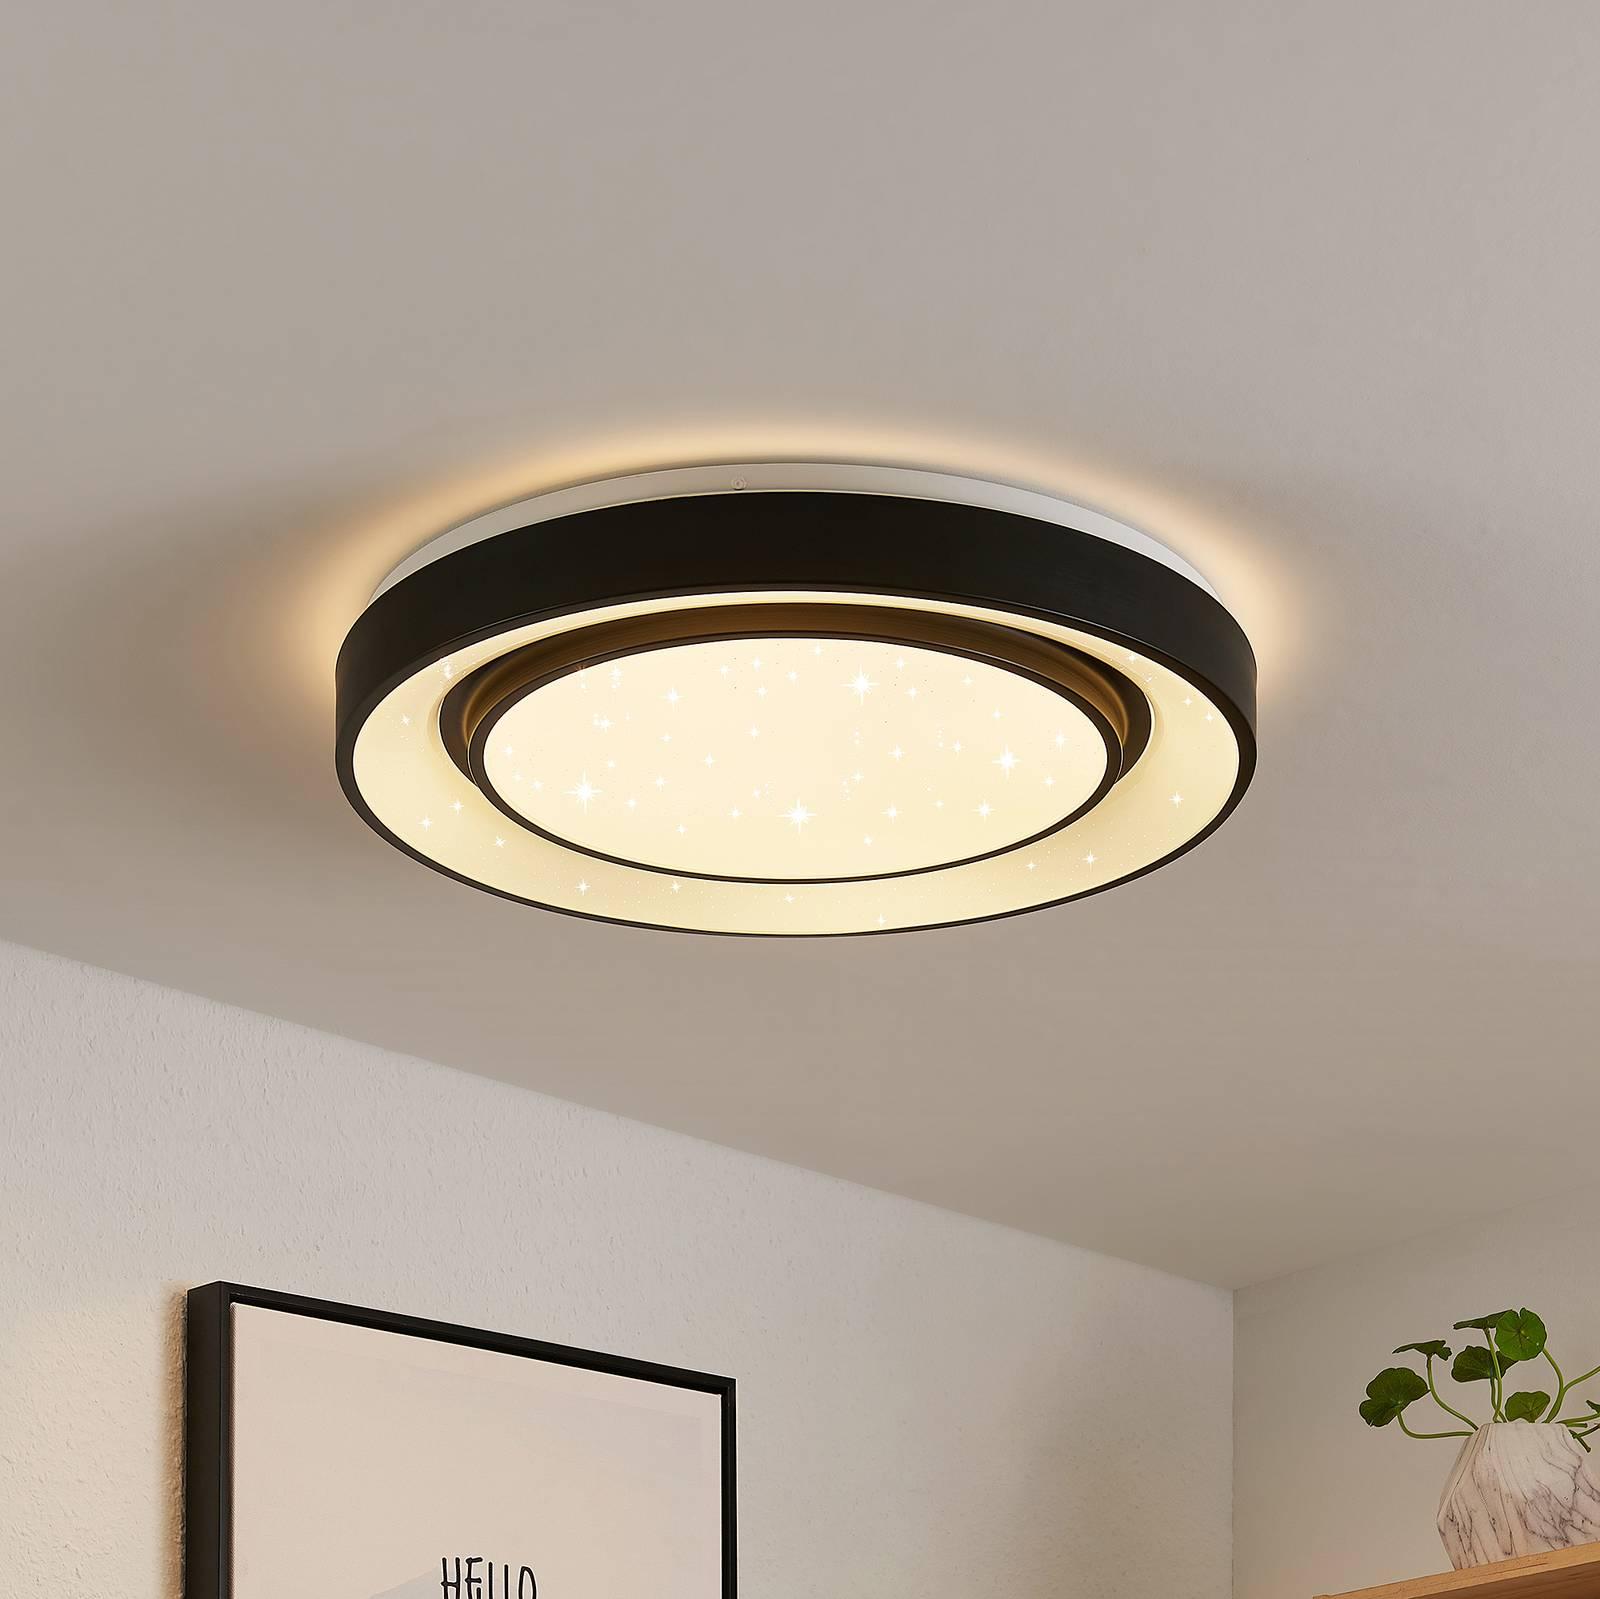 Lindby Gamino -LED-kattovalaisin, RGBW, CCT, 48 cm